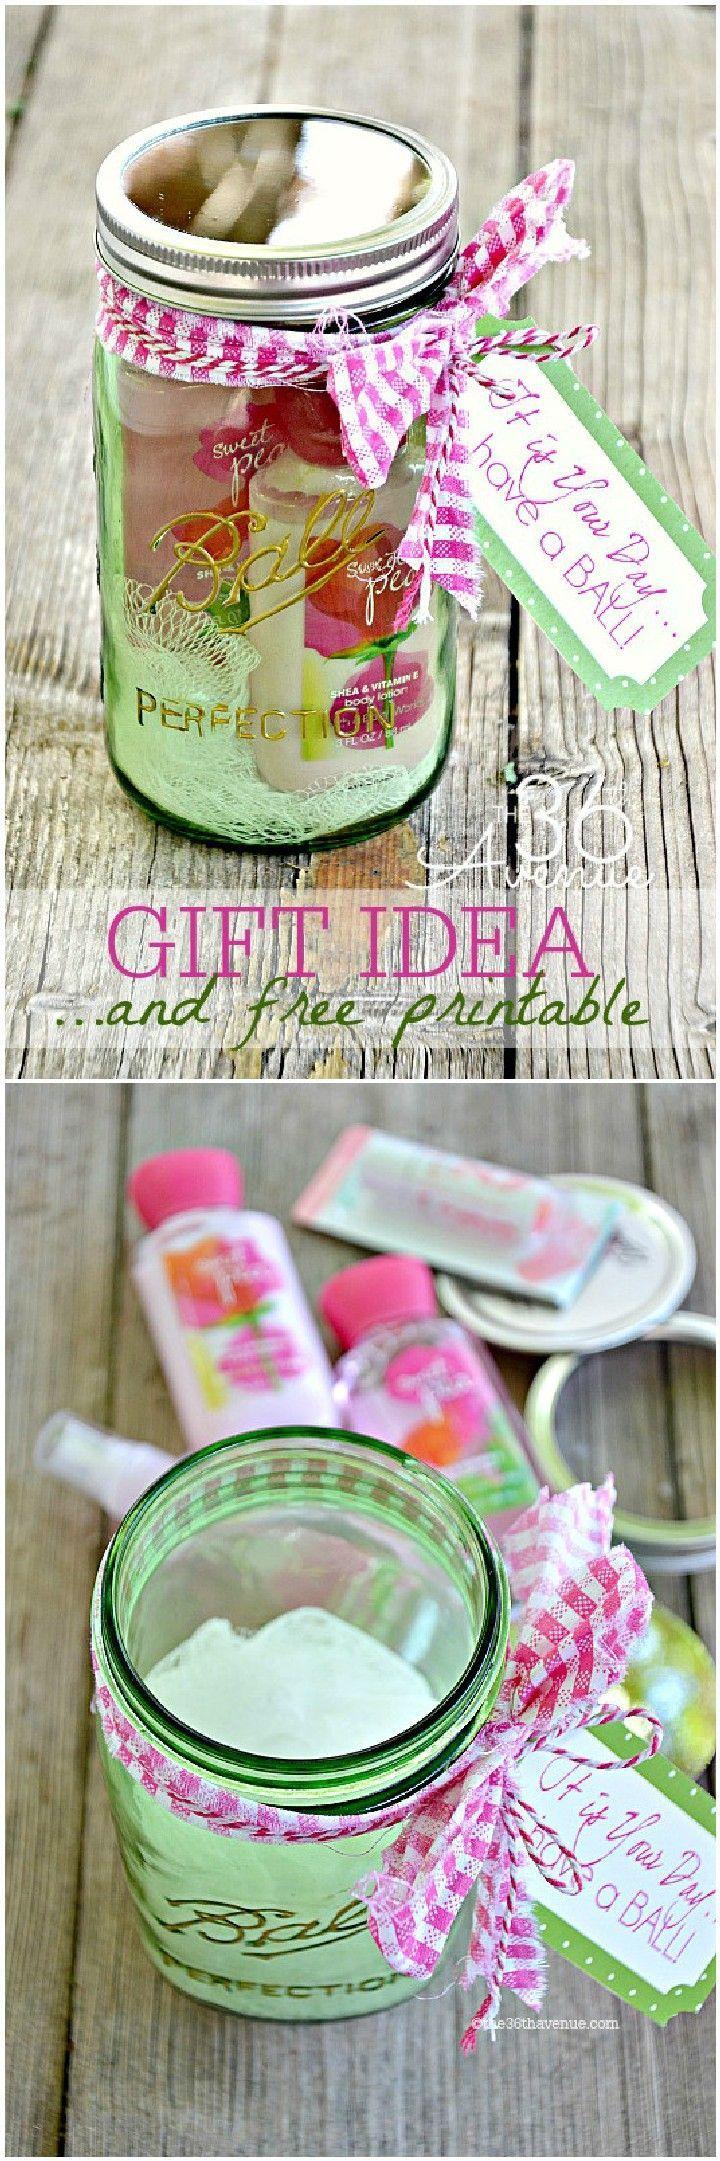 160+ DIY Mason Jar Crafts and Gift Ideas | Mason jars | Pinterest ...